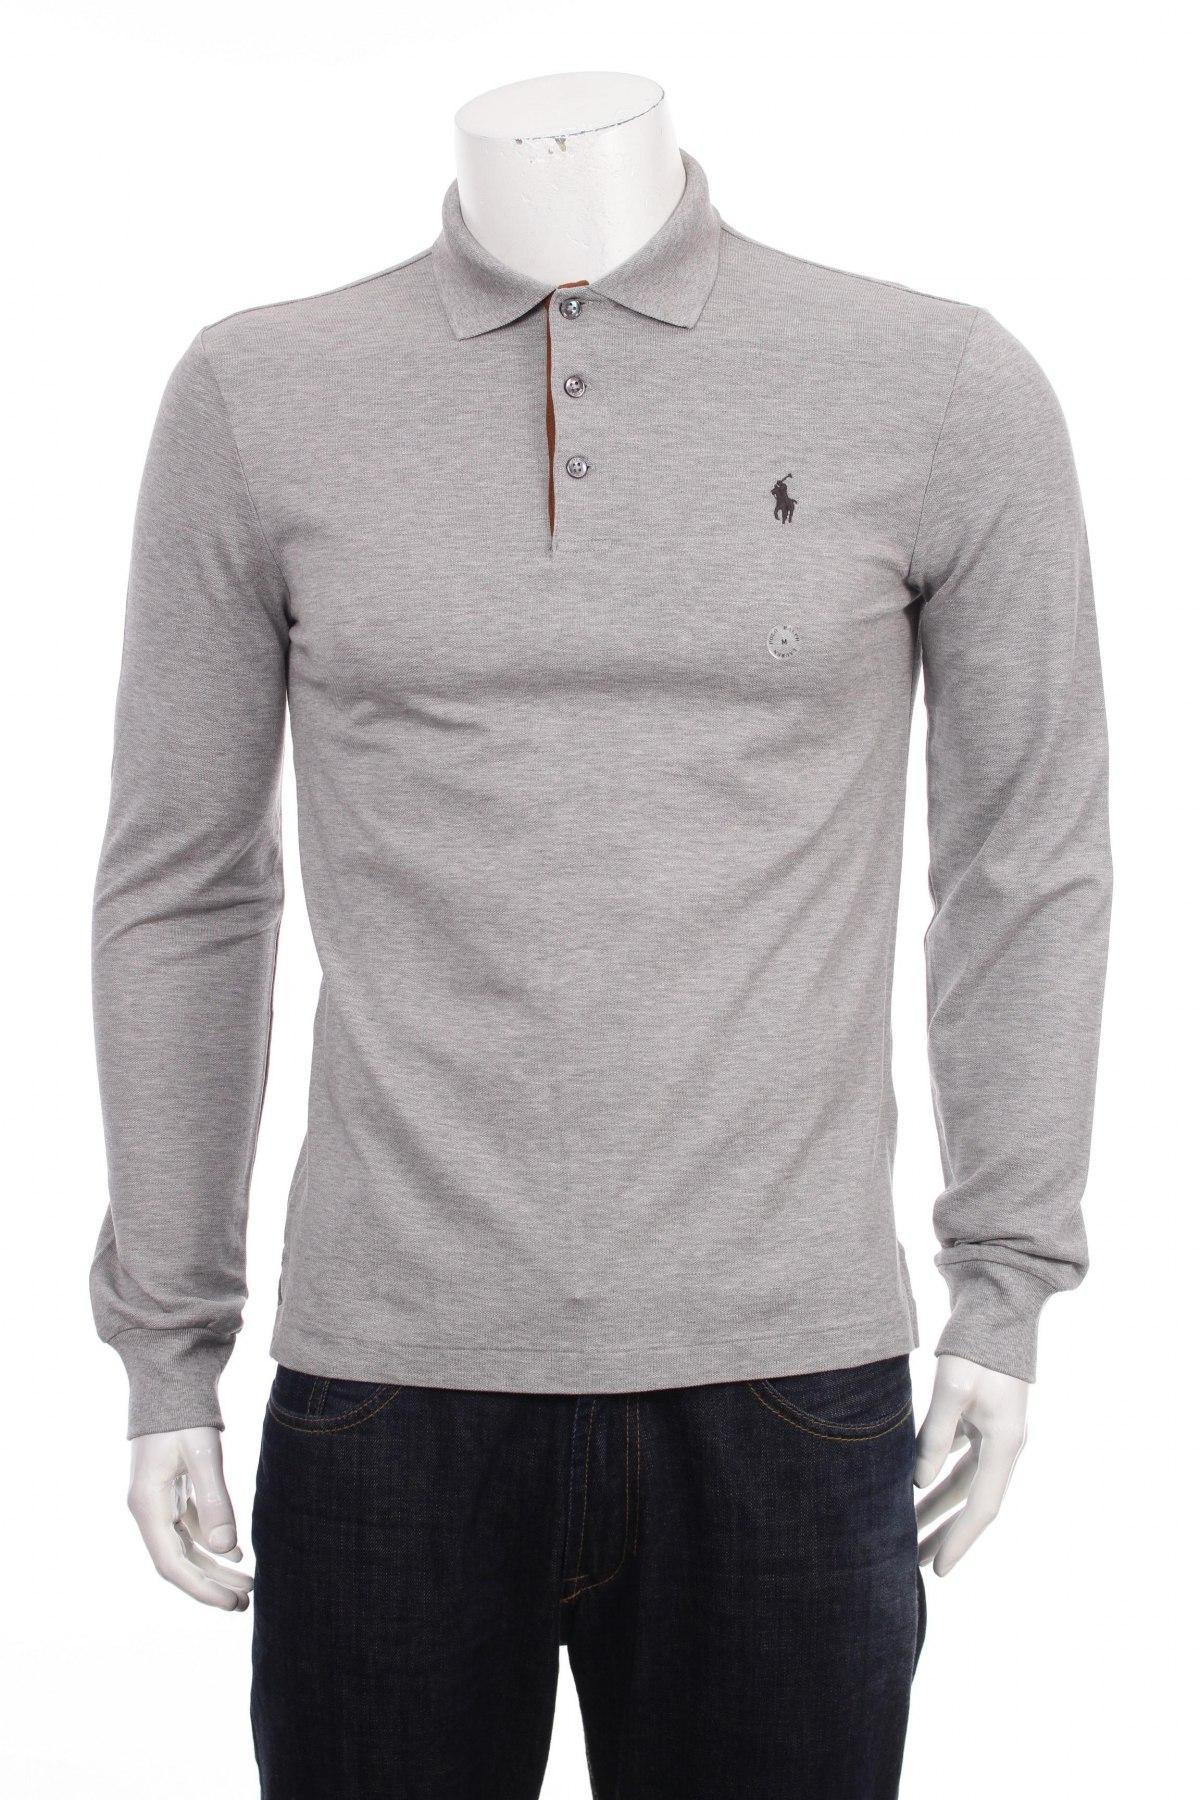 8a79c2a163d9 Ανδρική μπλούζα Polo By Ralph Lauren - σε συμφέρουσα τιμή στο Remix ...